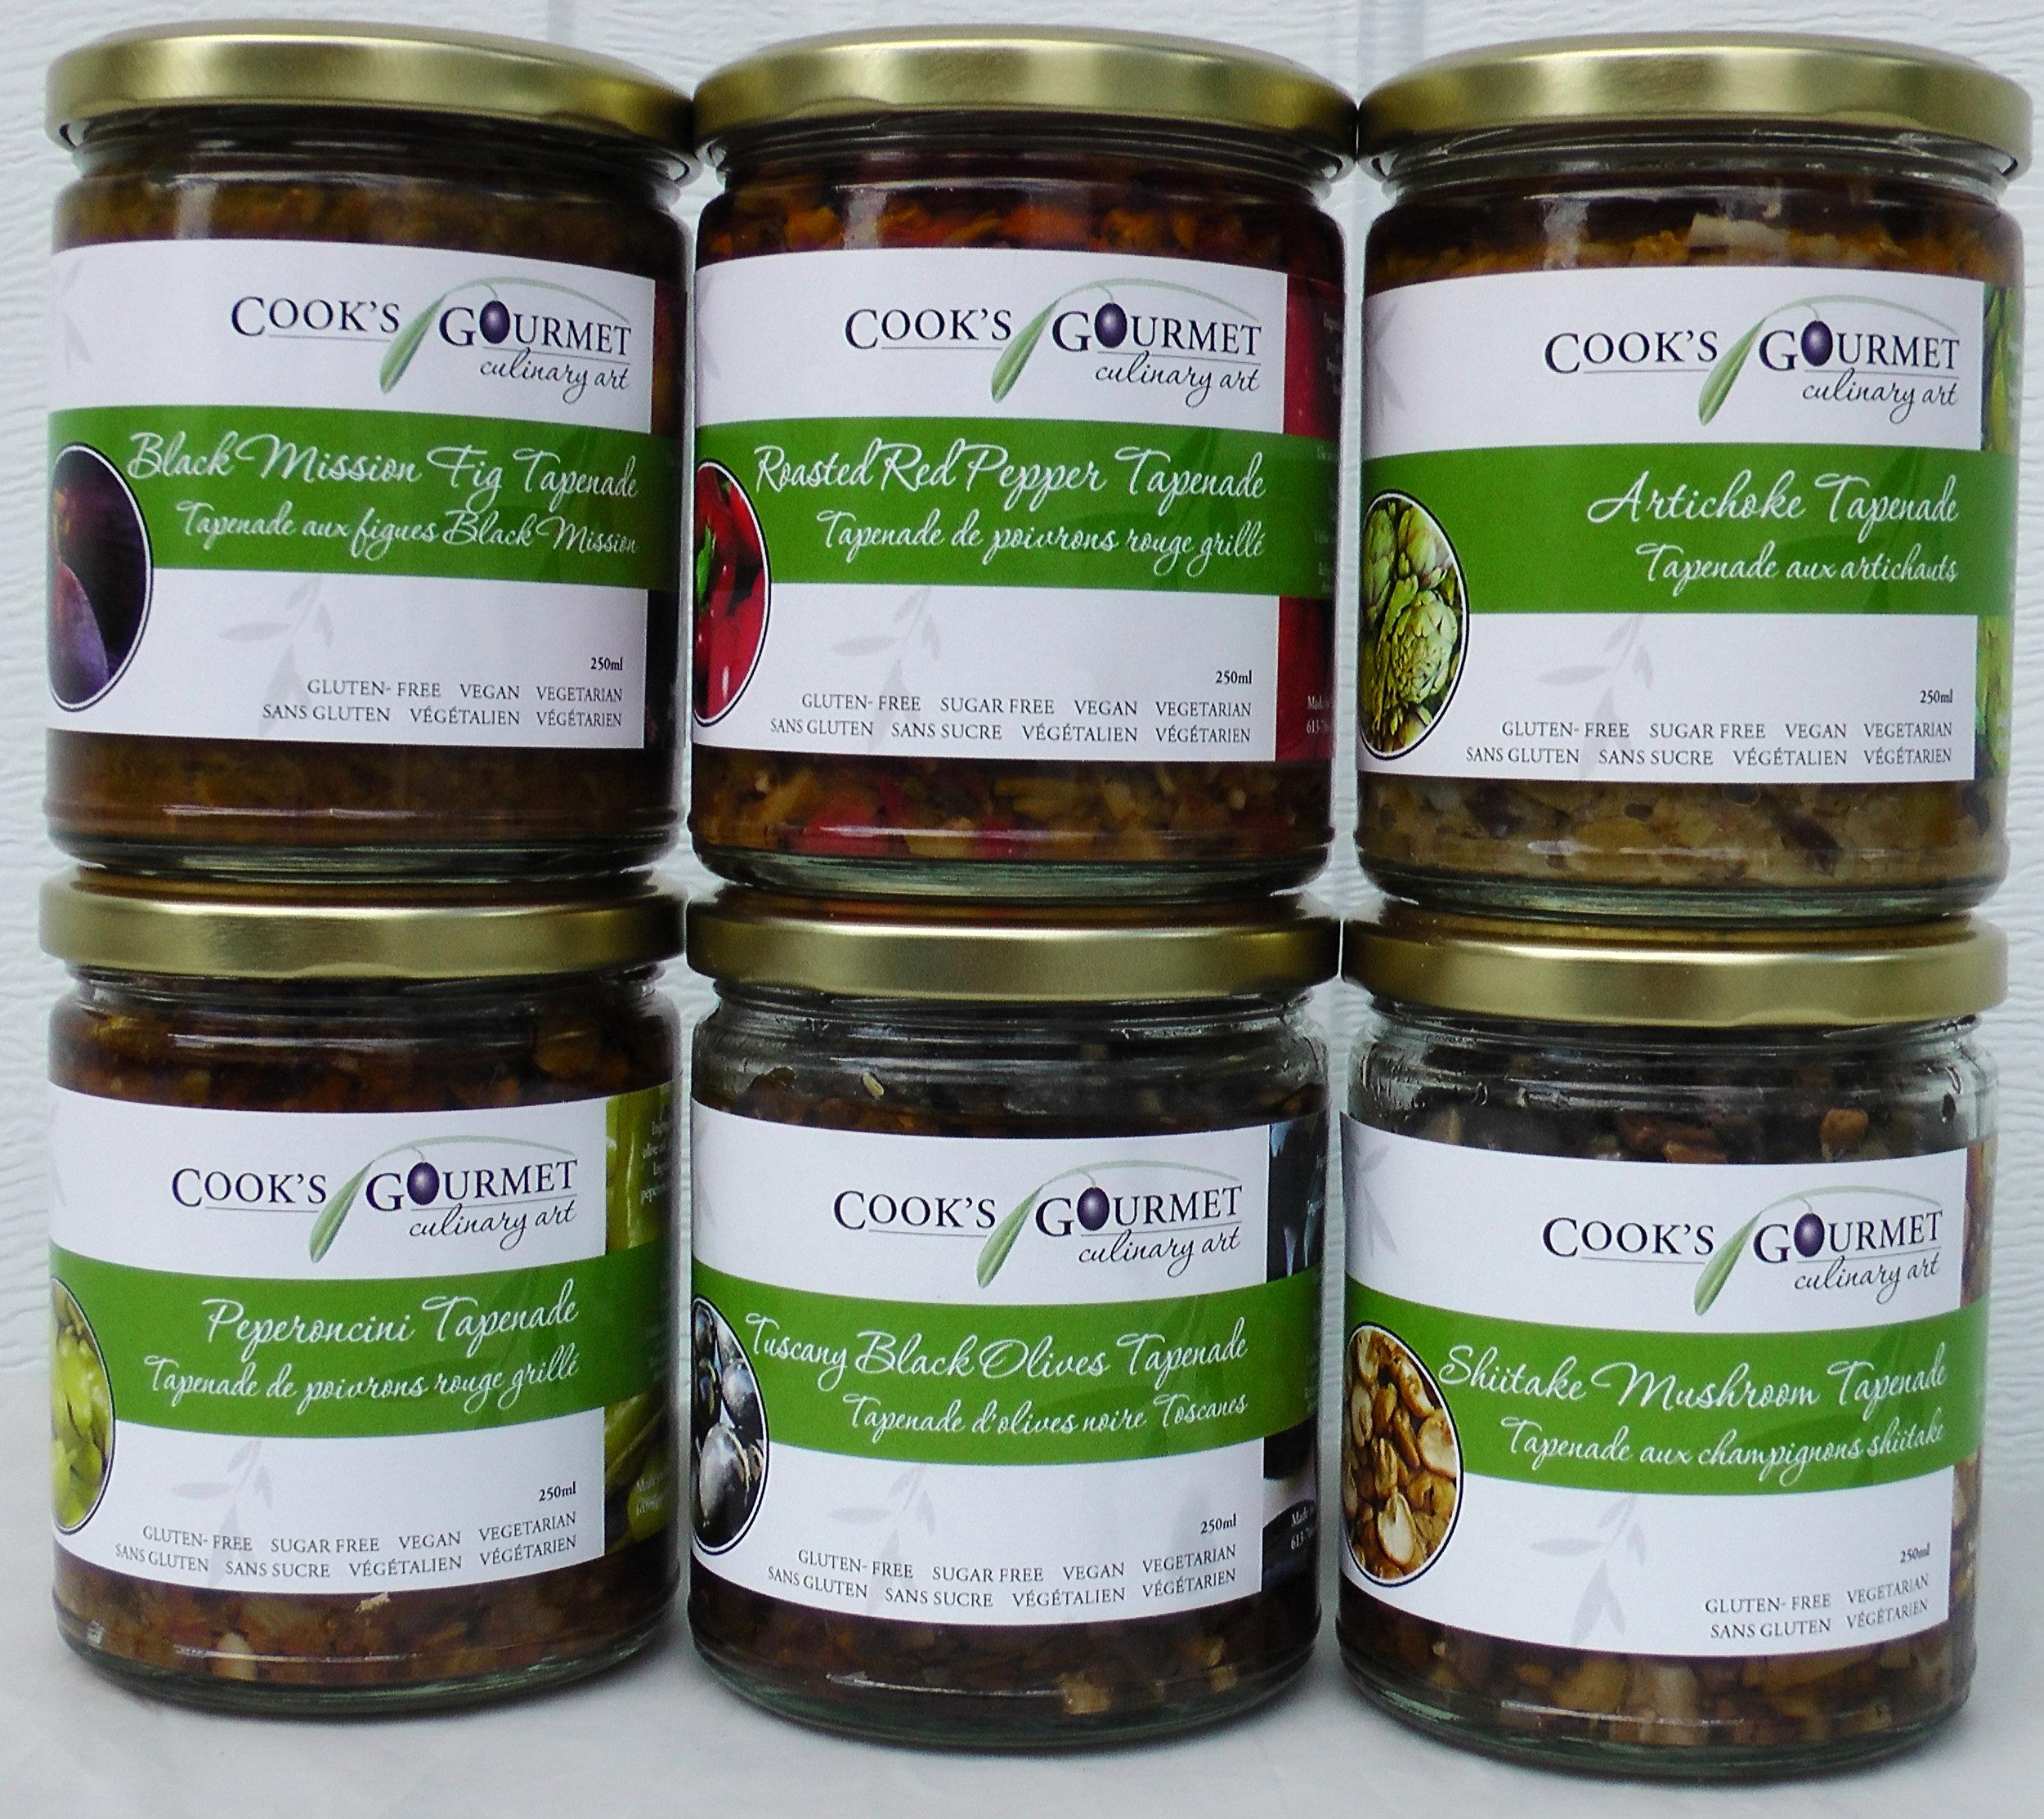 Cooks_gourmet_Artfest copy.jpg